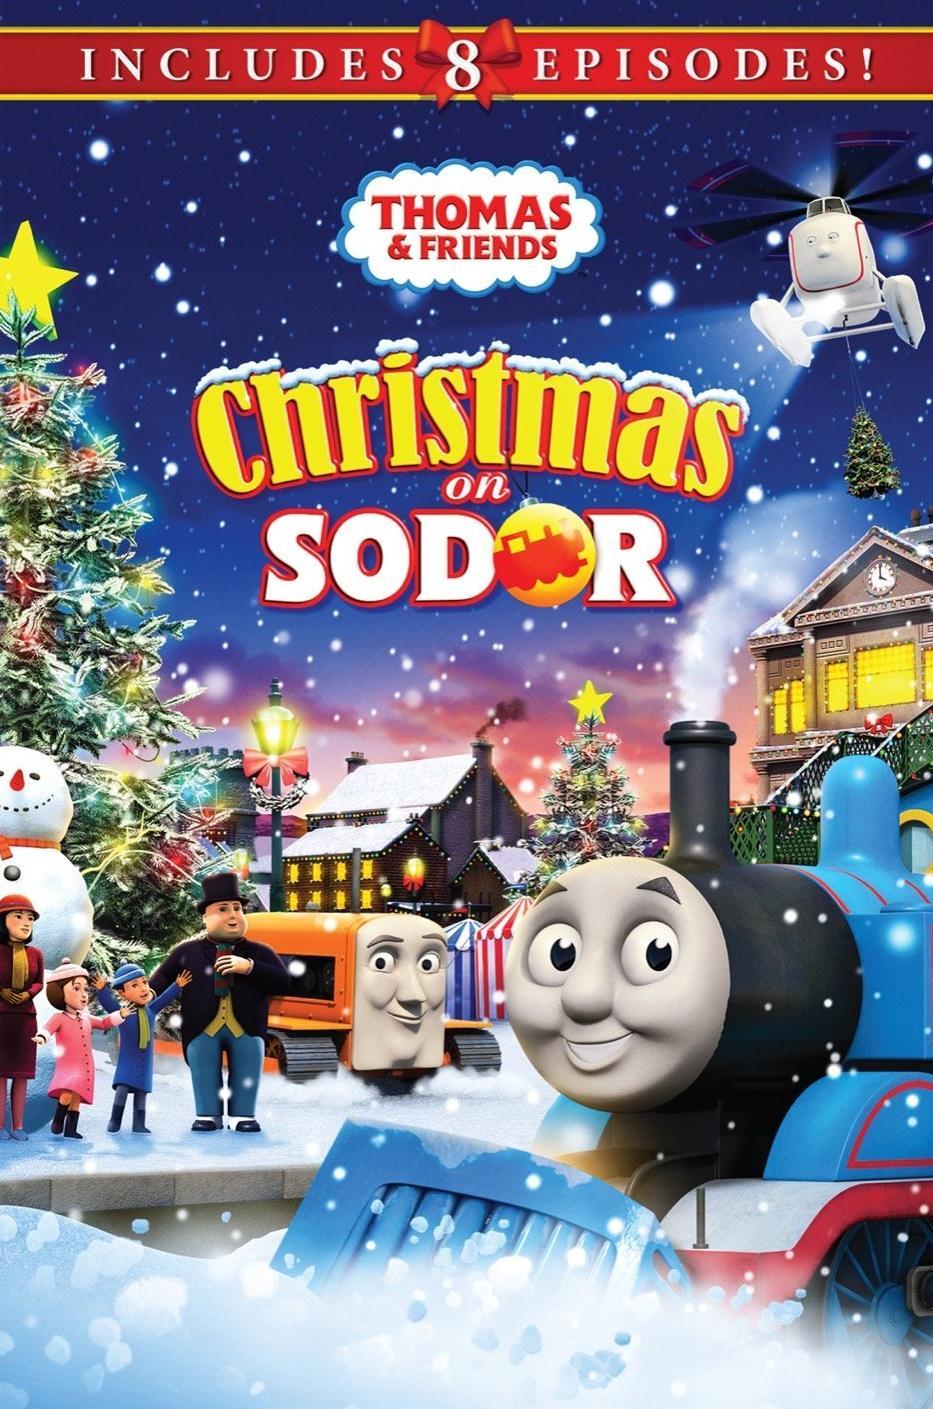 Christmas on Sodor | Thomas the Tank Engine Wikia | FANDOM powered ...